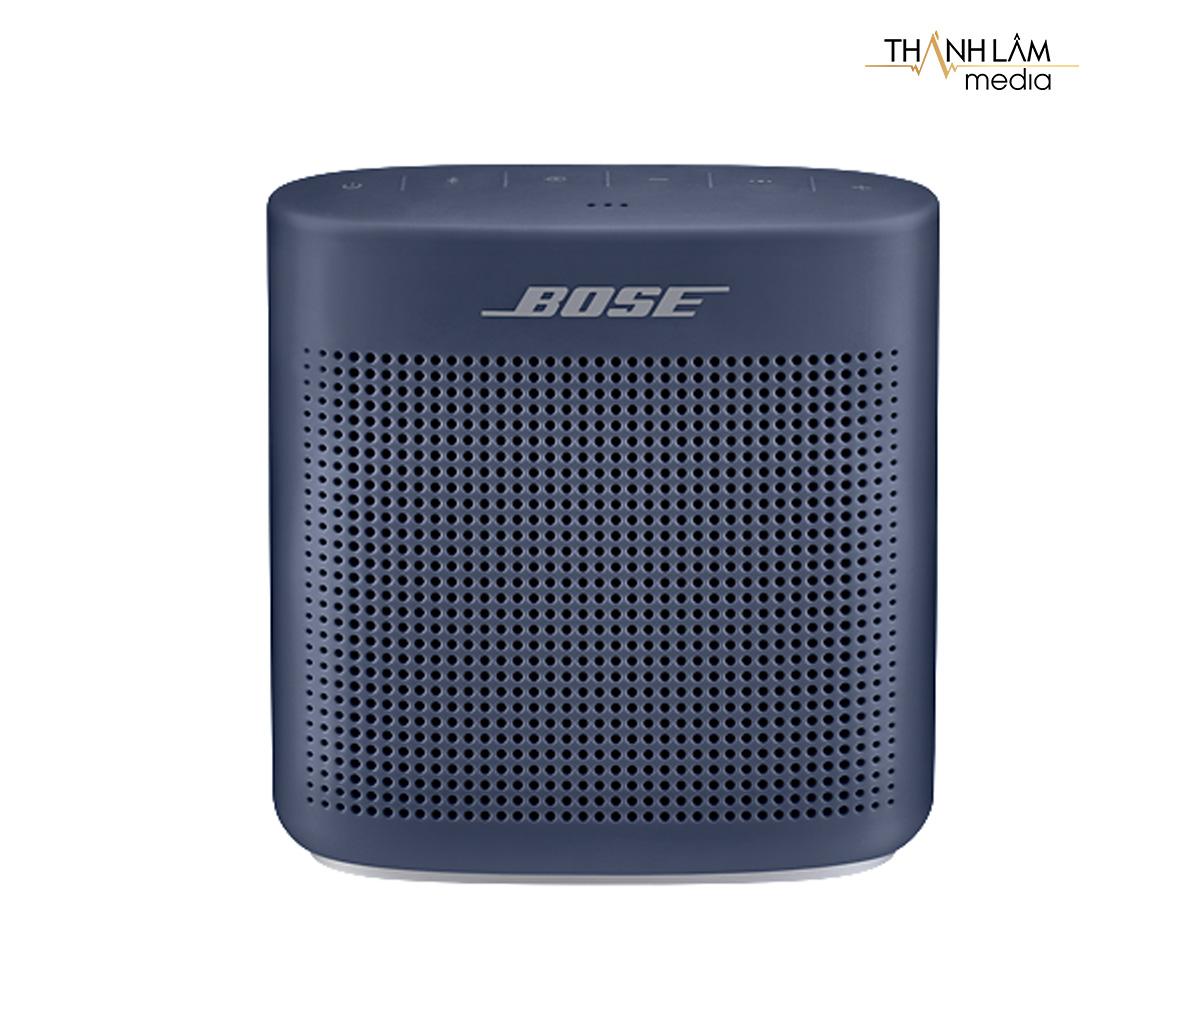 Loa-Bose-SoundLink-Color-2-Xanh-Tim-Than-2